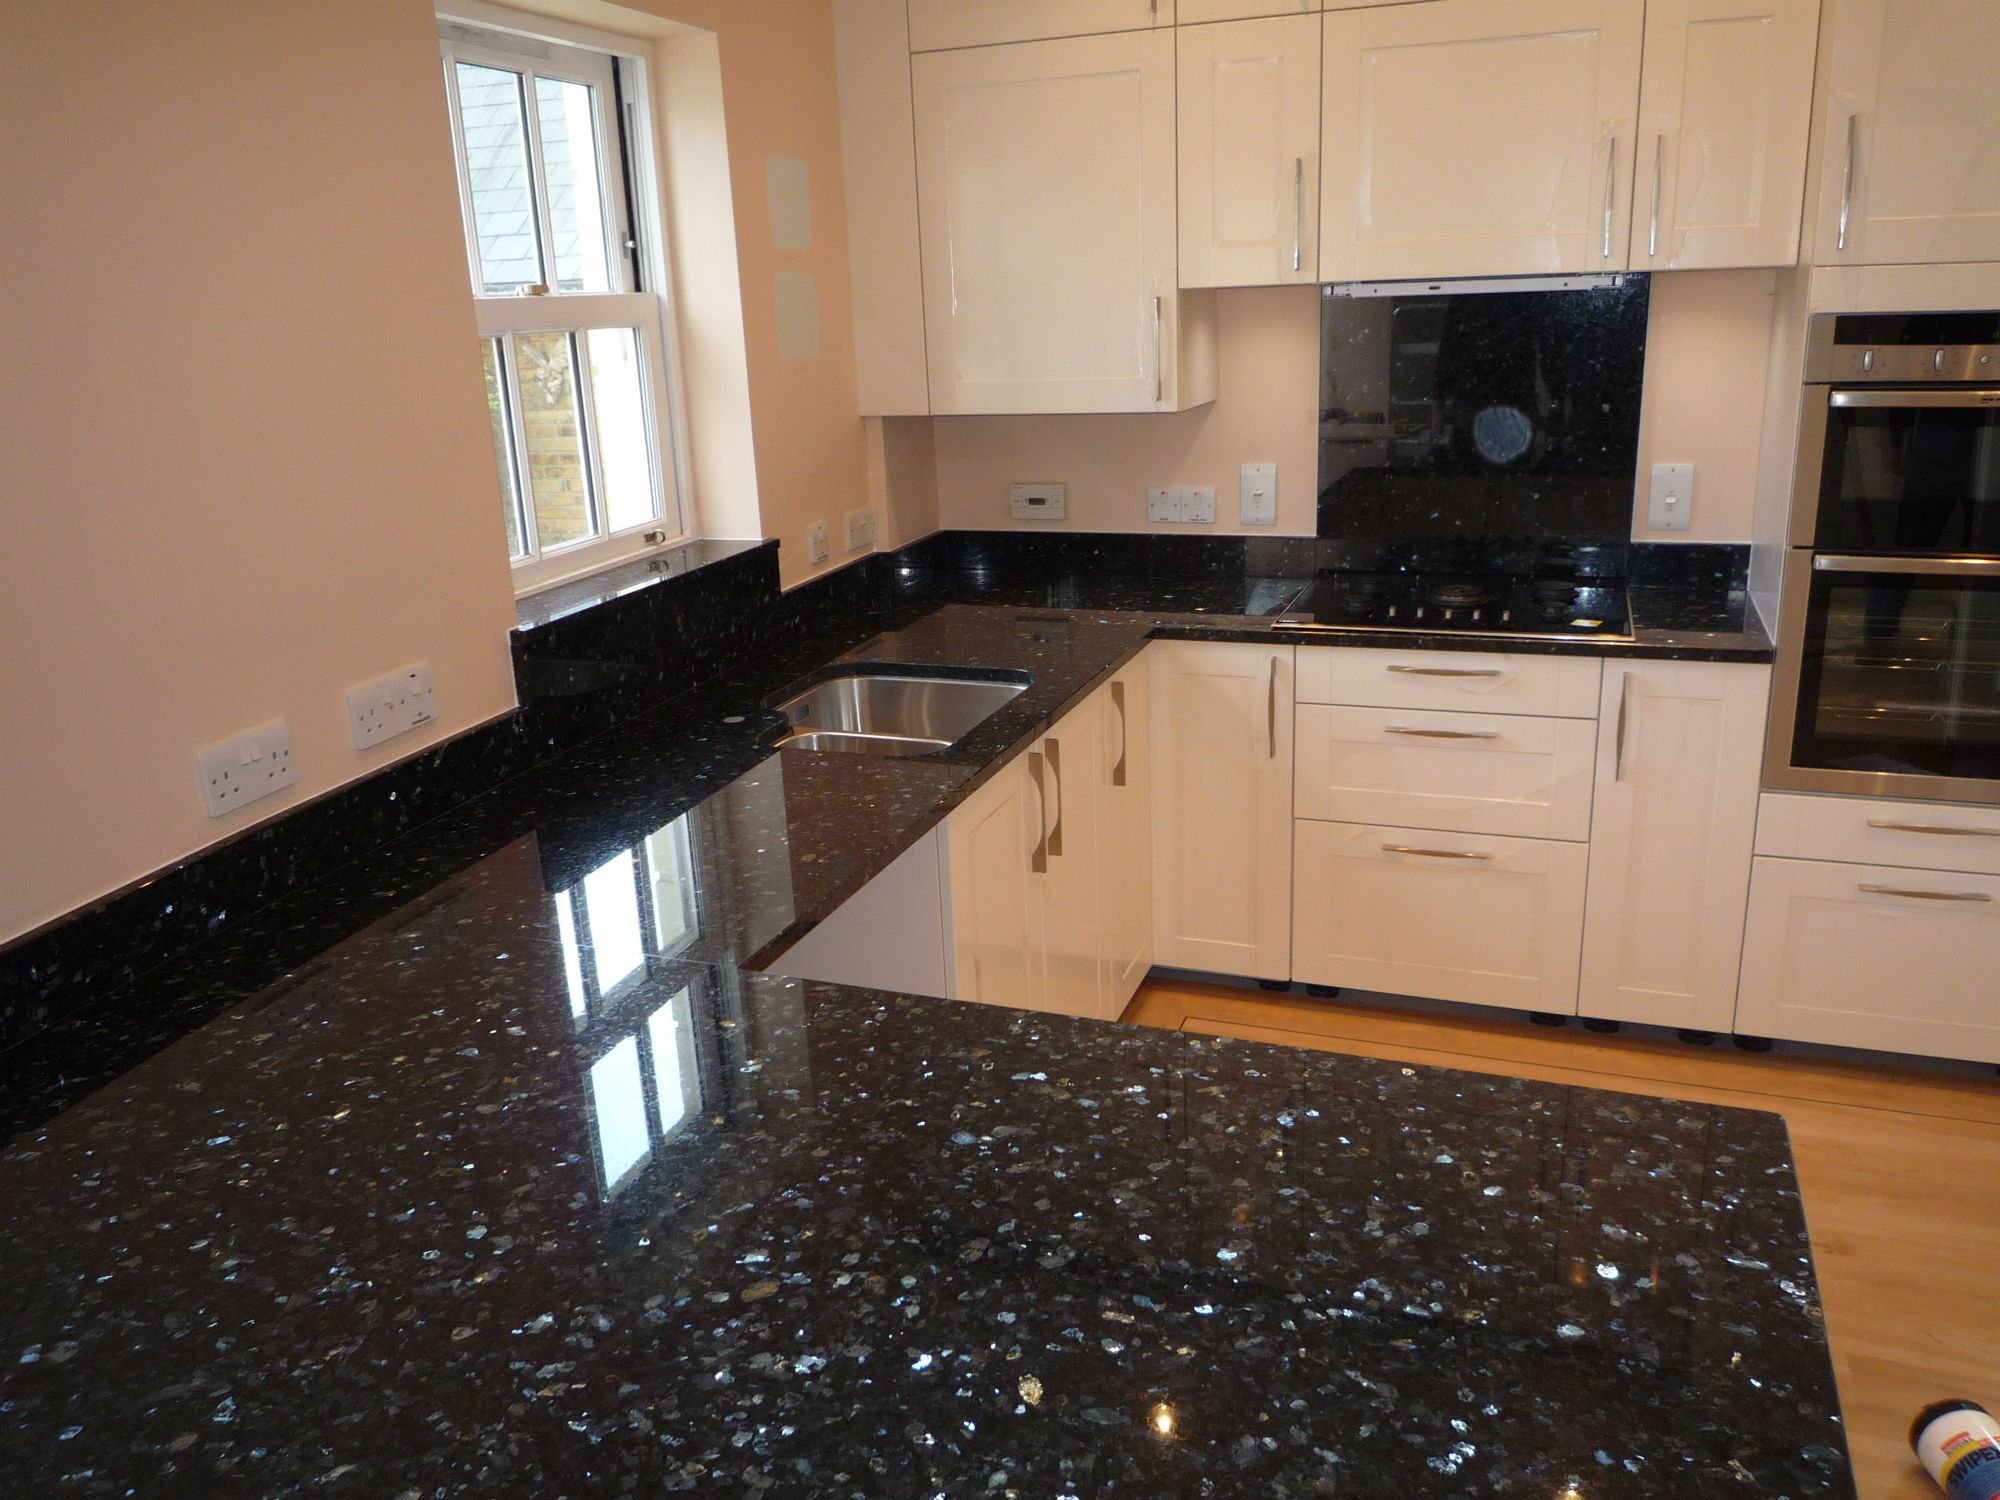 blue pearl granite kitchen glacier bay faucet countertops google search awesome